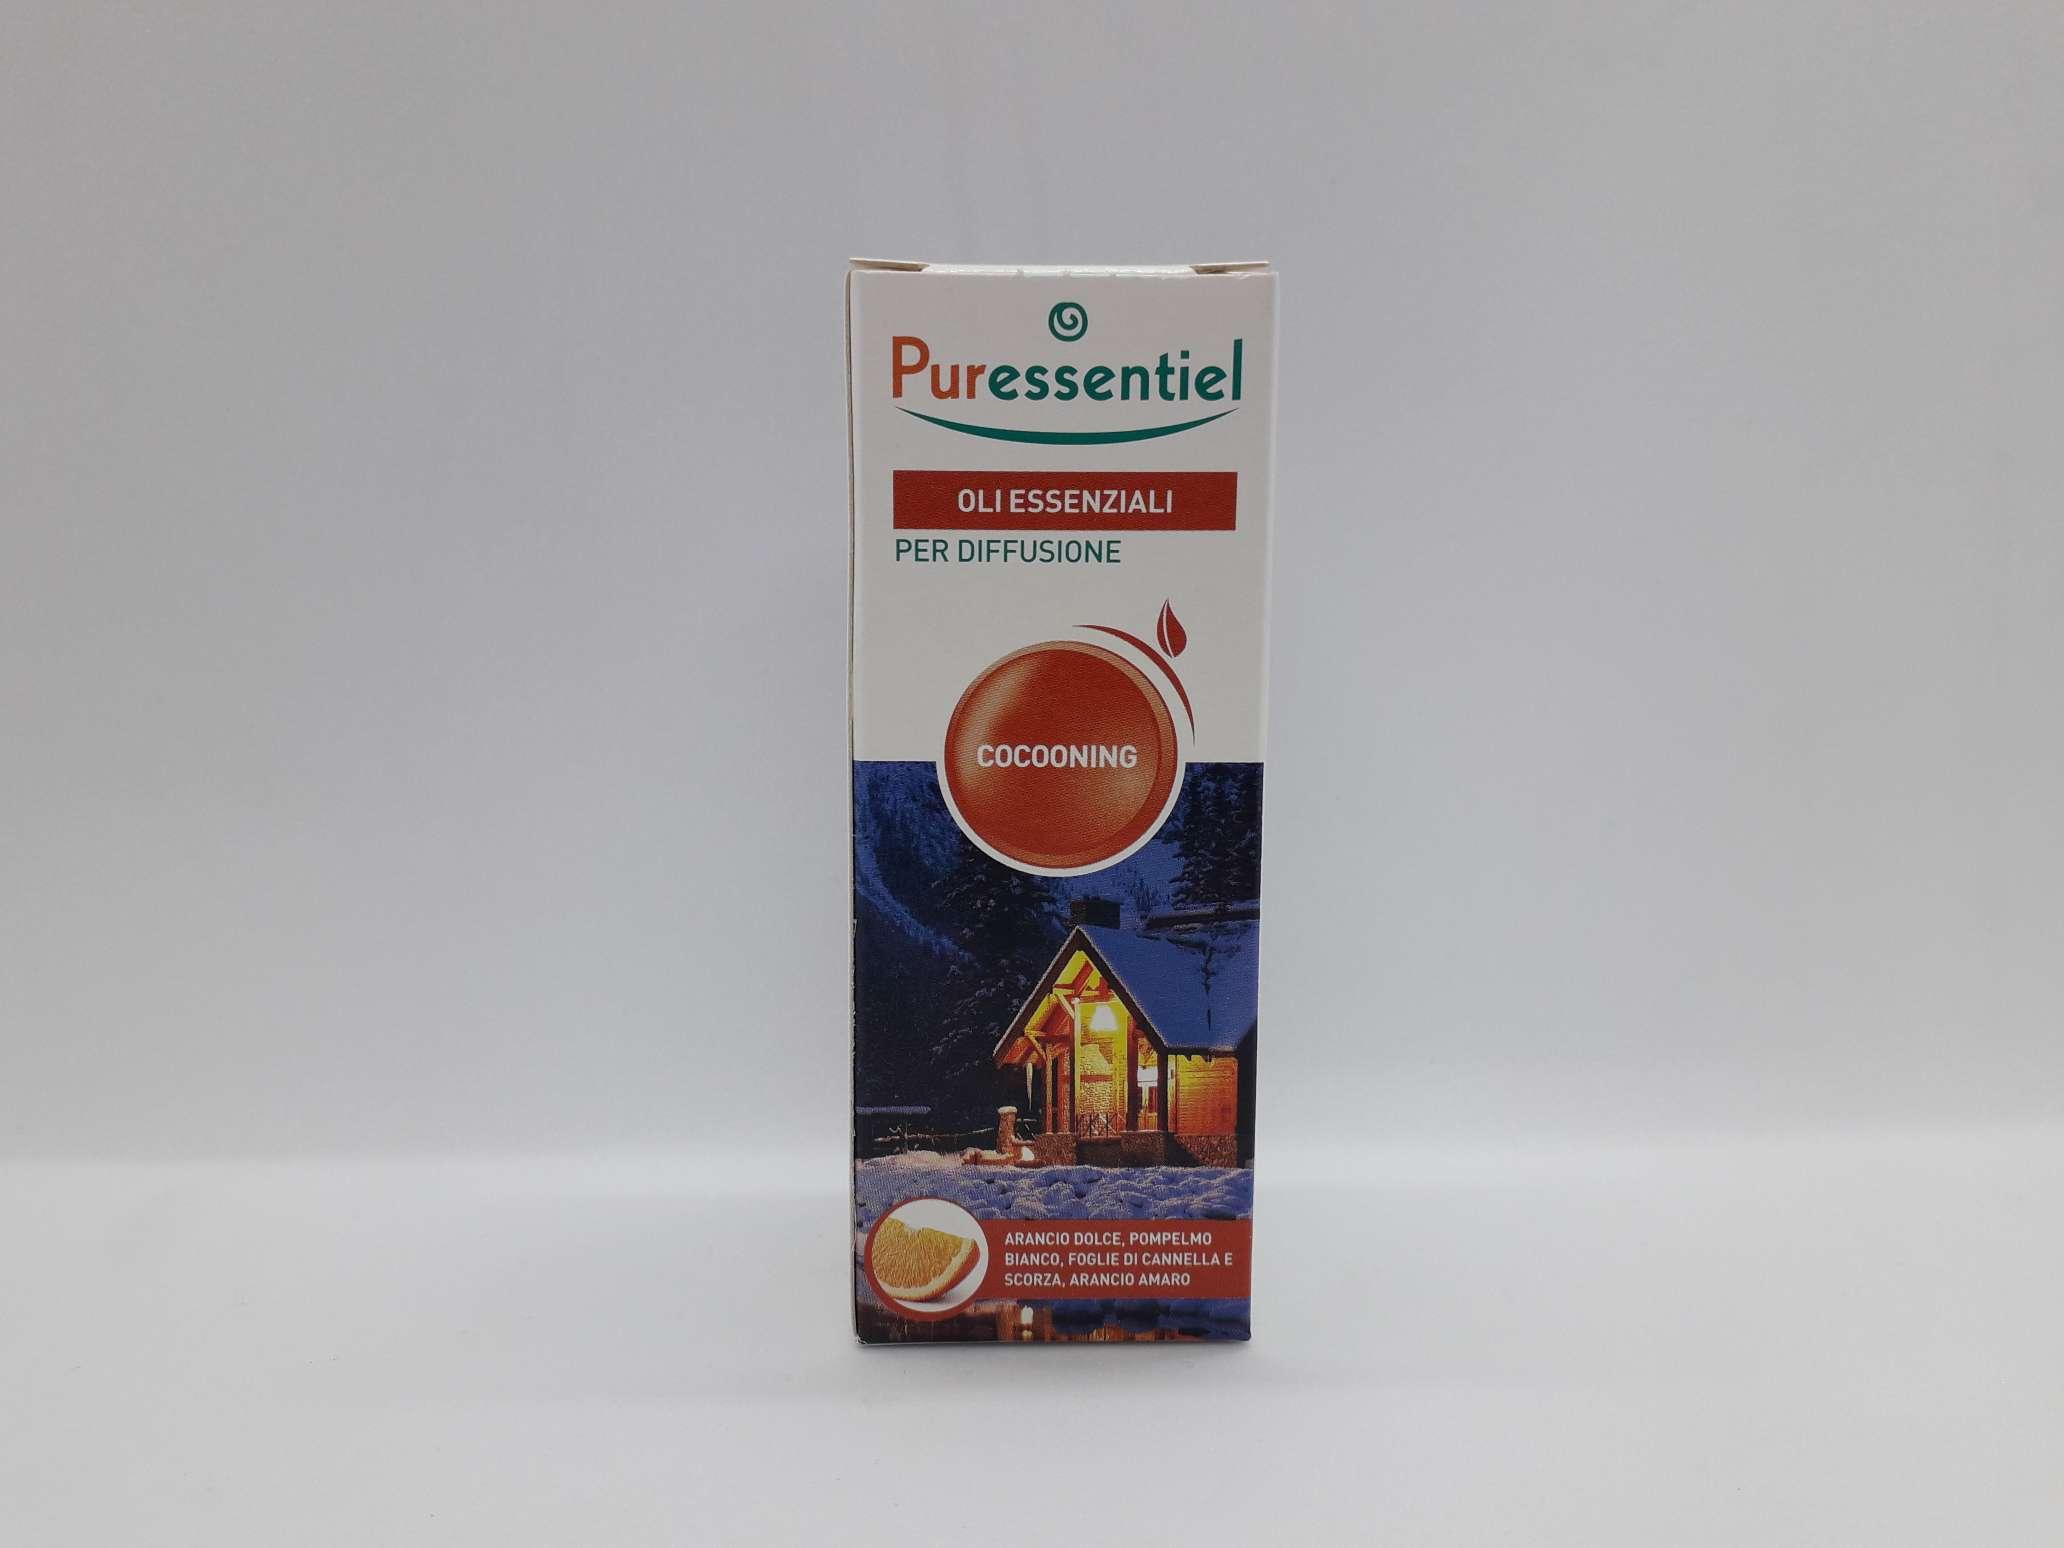 MISCELA COCOONING PER DIFFUSIONE 30 ML - Farmaciaempatica.it